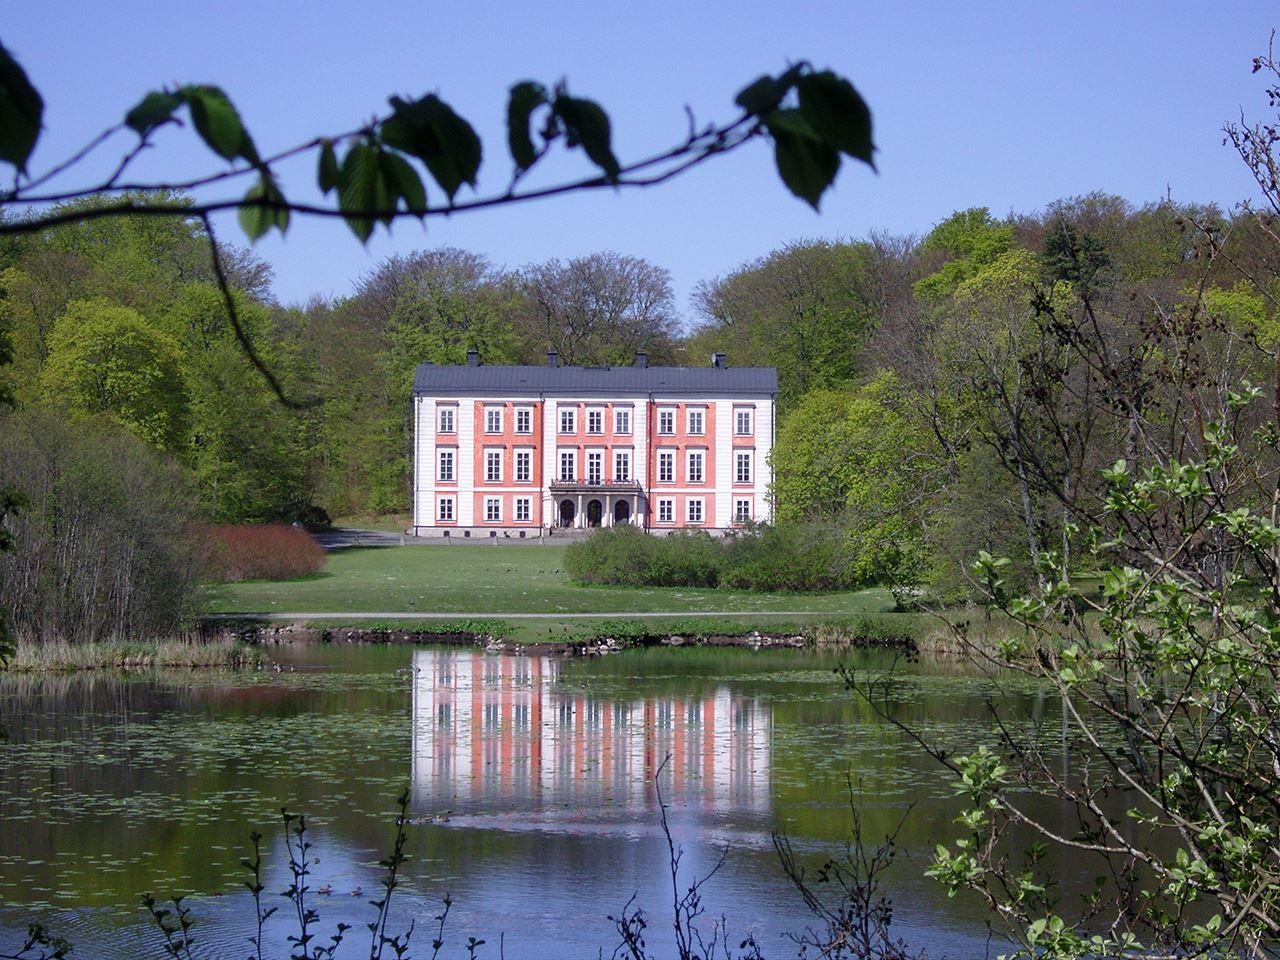 Ovesholms slott och slottspark